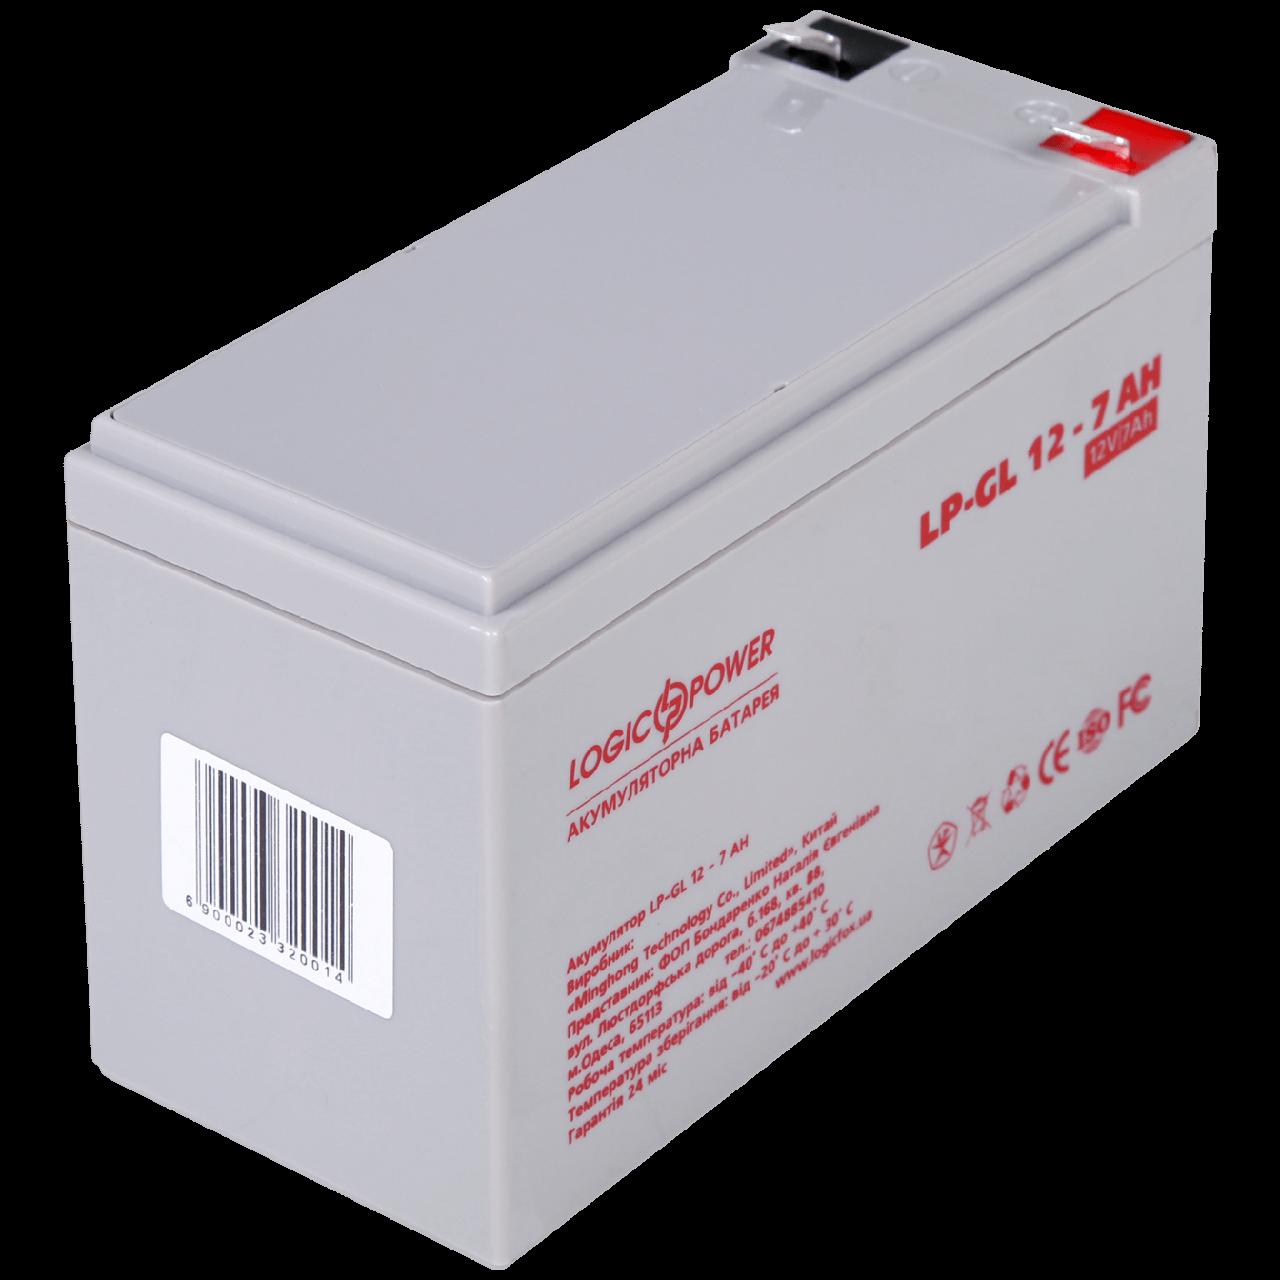 Акумулятор гелевий LP-GL 12 - 7 AH